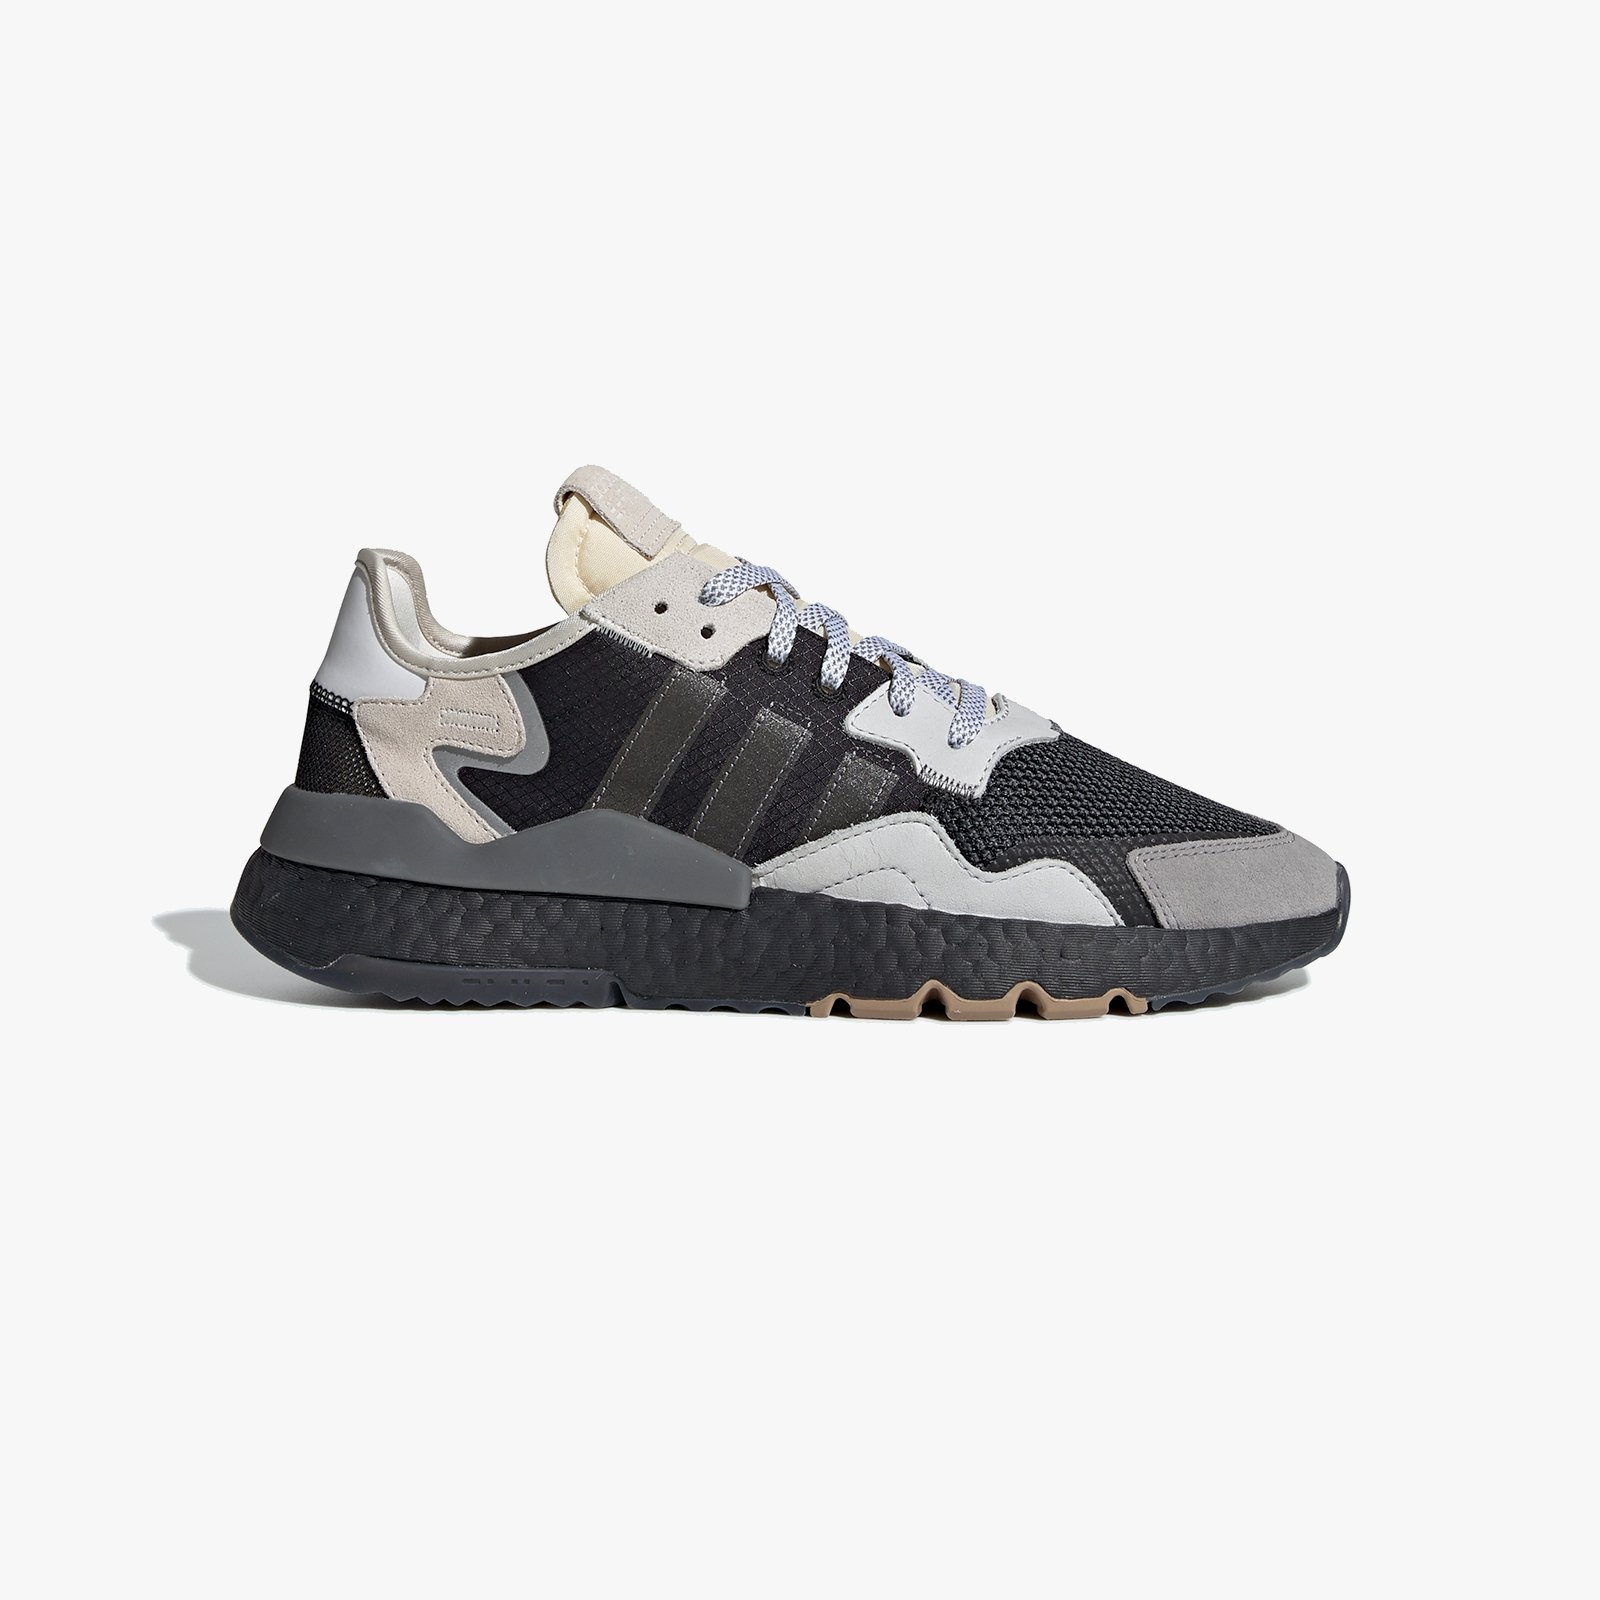 3eb28efb805e5 adidas Nite Jogger - Bd7933 - Sneakersnstuff